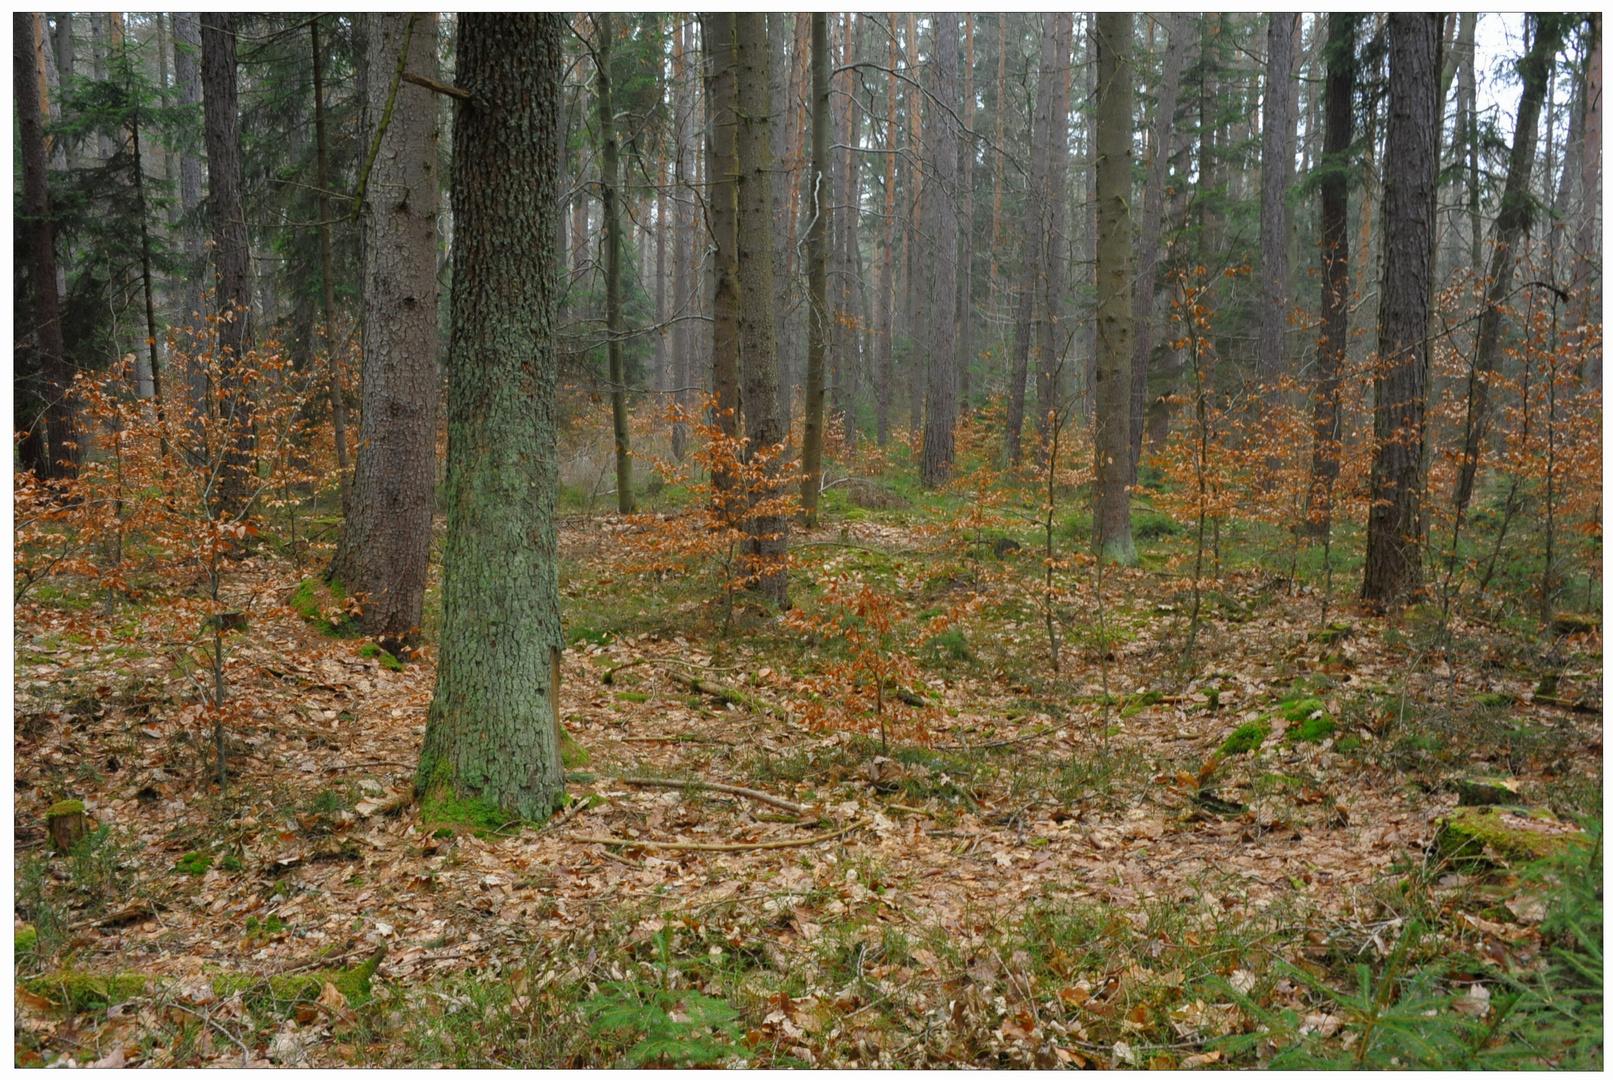 Heute im Wald II (Hoy en el bosque II)